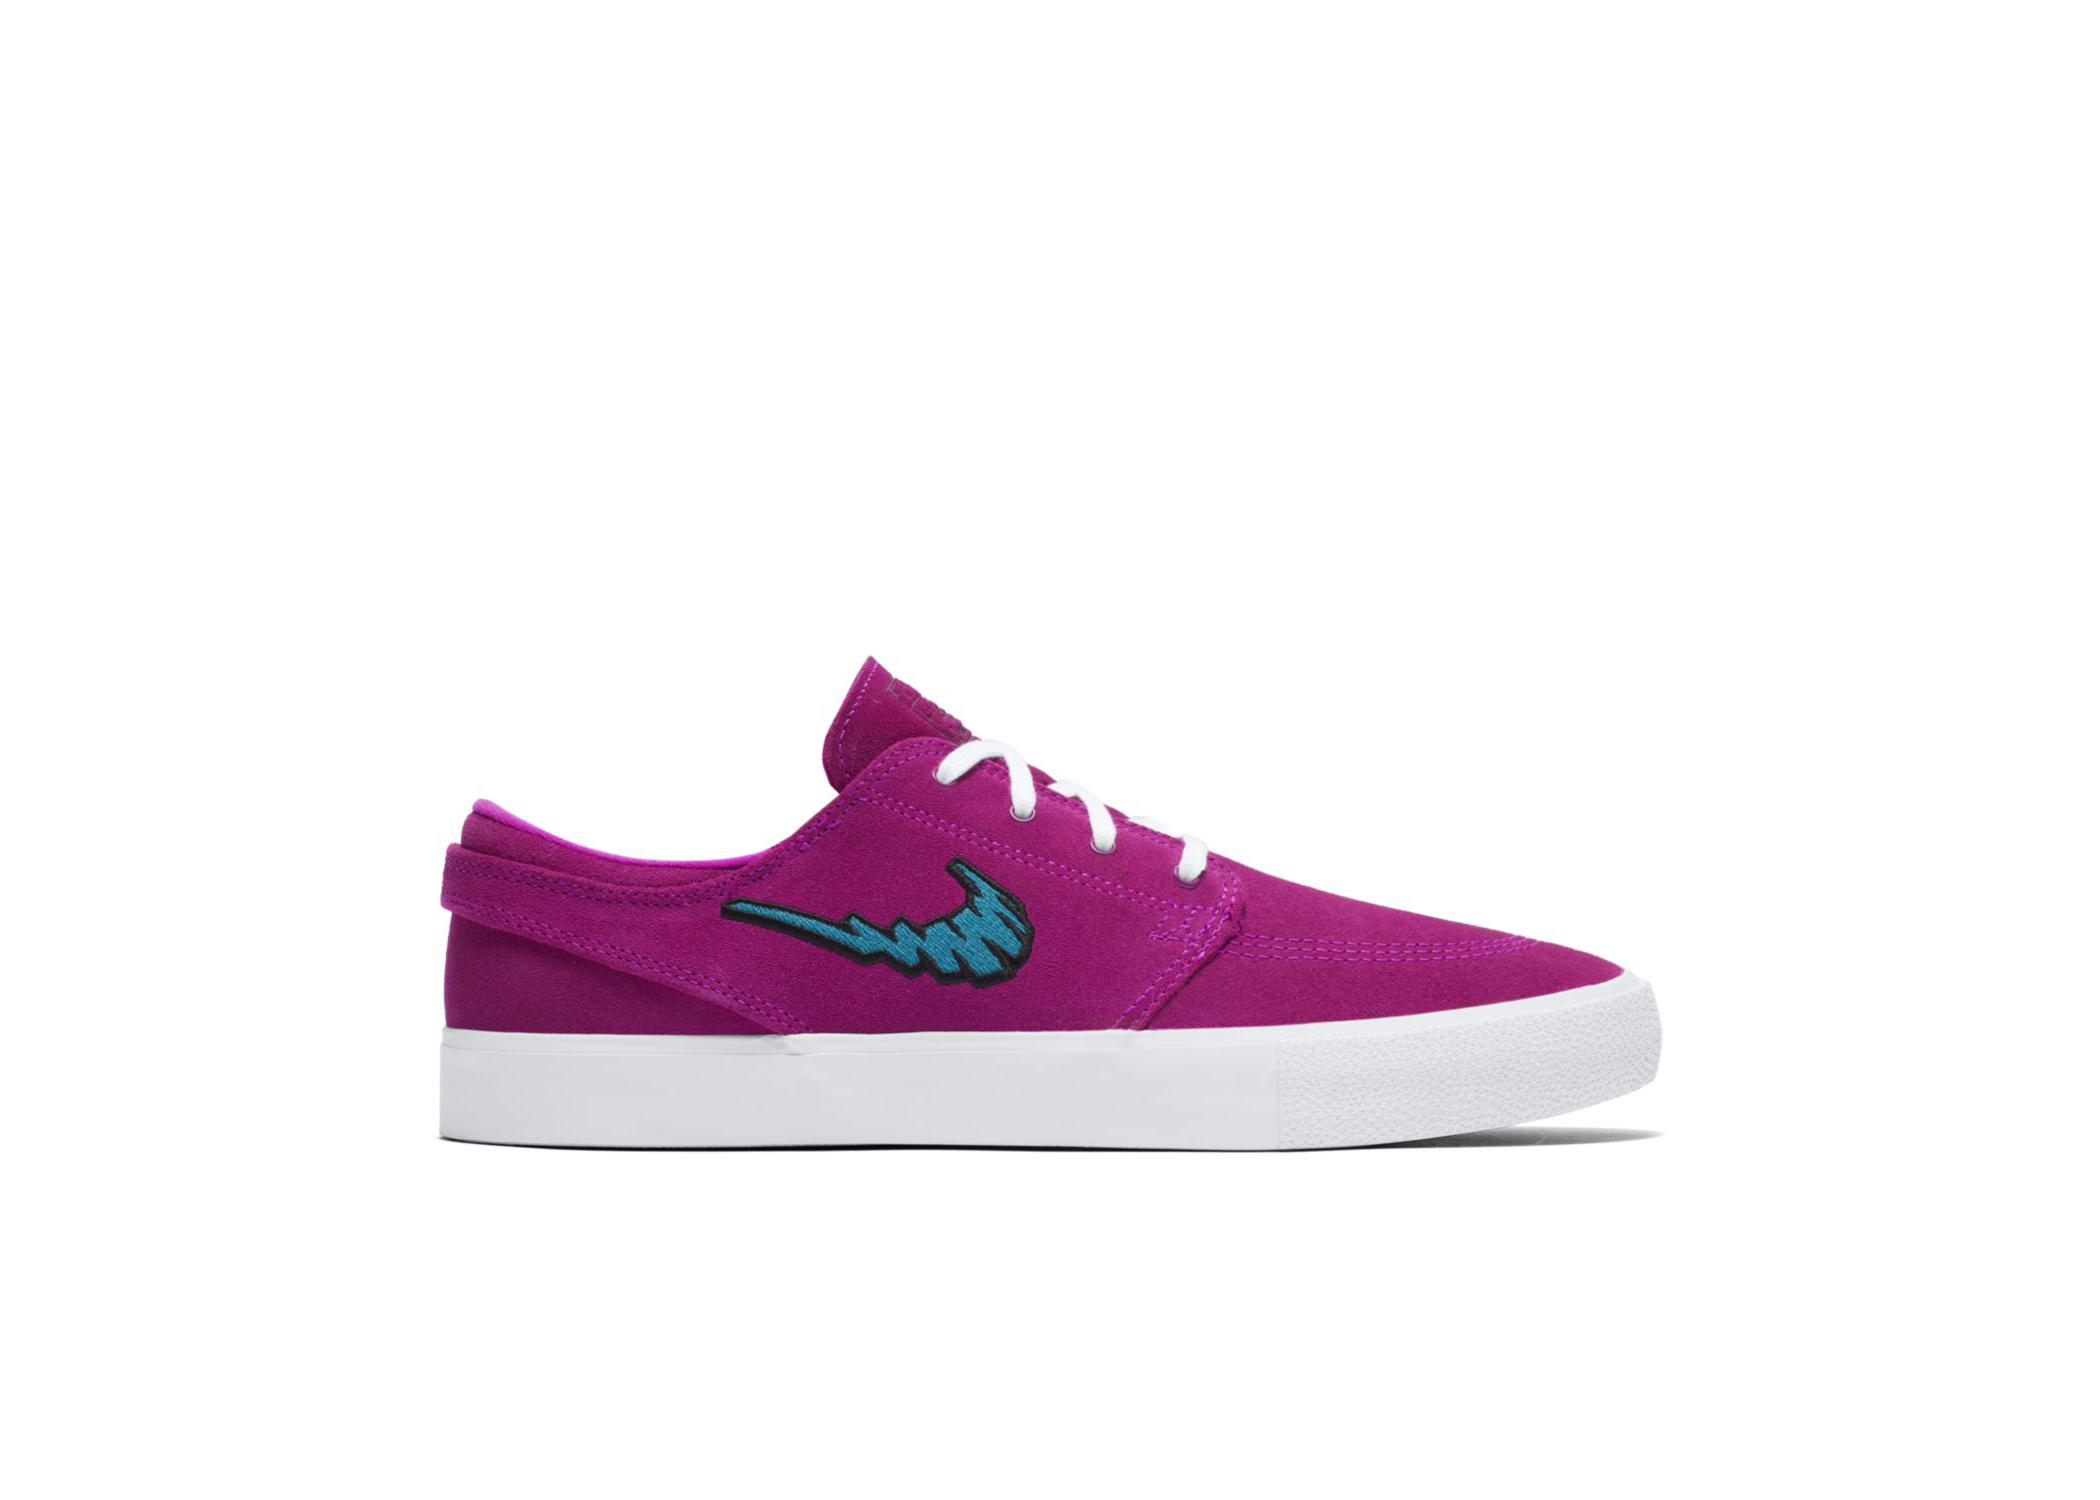 Nike SB Zoom Stefan Janoski RM Vivid Purple - AQ7475-500